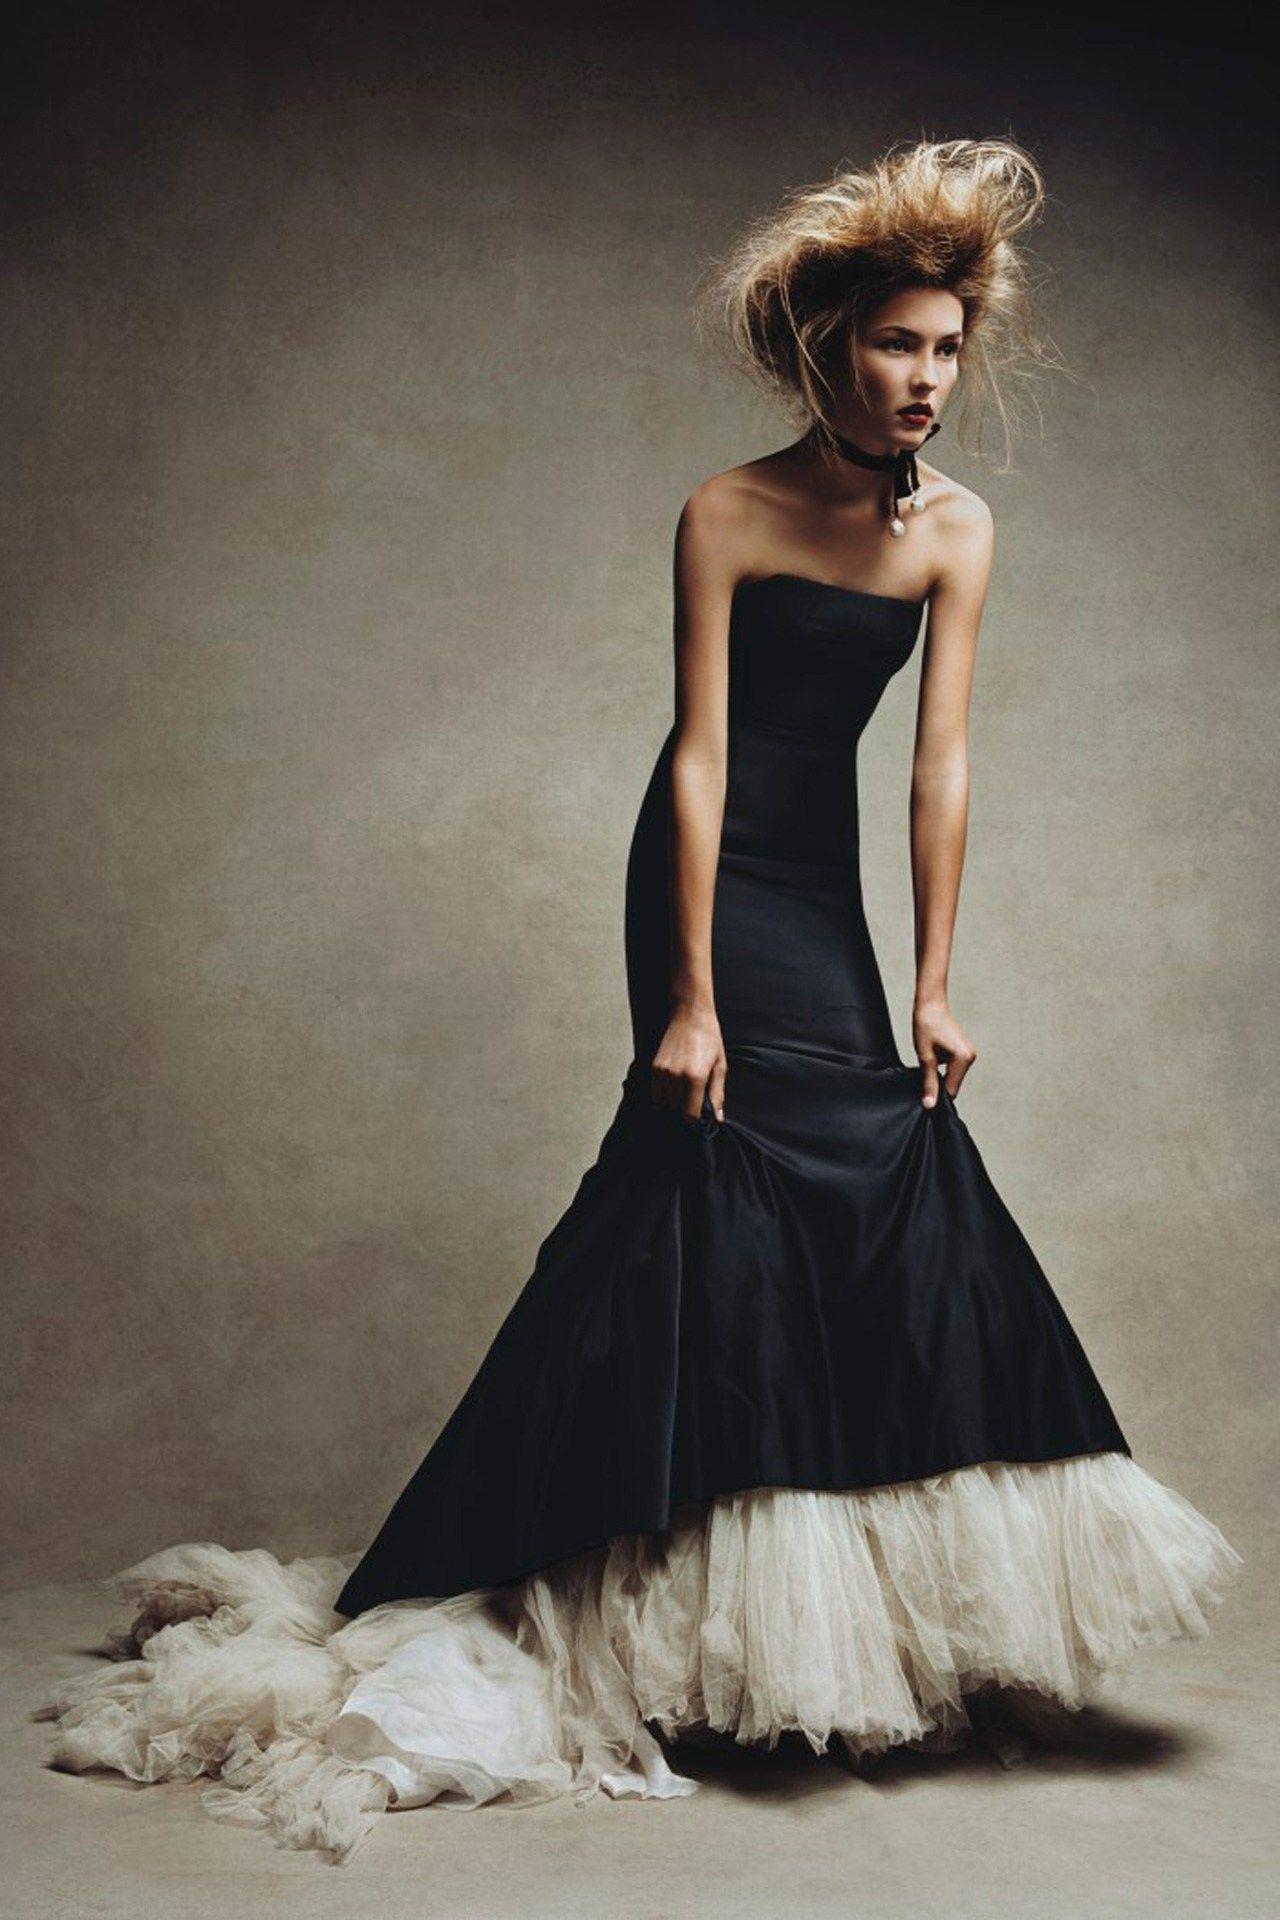 Mcqueen 2005 Photo By Patrick Demarchelier 1280 X 1920 Michaeloxoxo Jonxoxoxo Emmaruthxoxo Emmammerrick Mak Beautiful Dresses Fashion Pretty Dresses [ 1920 x 1280 Pixel ]